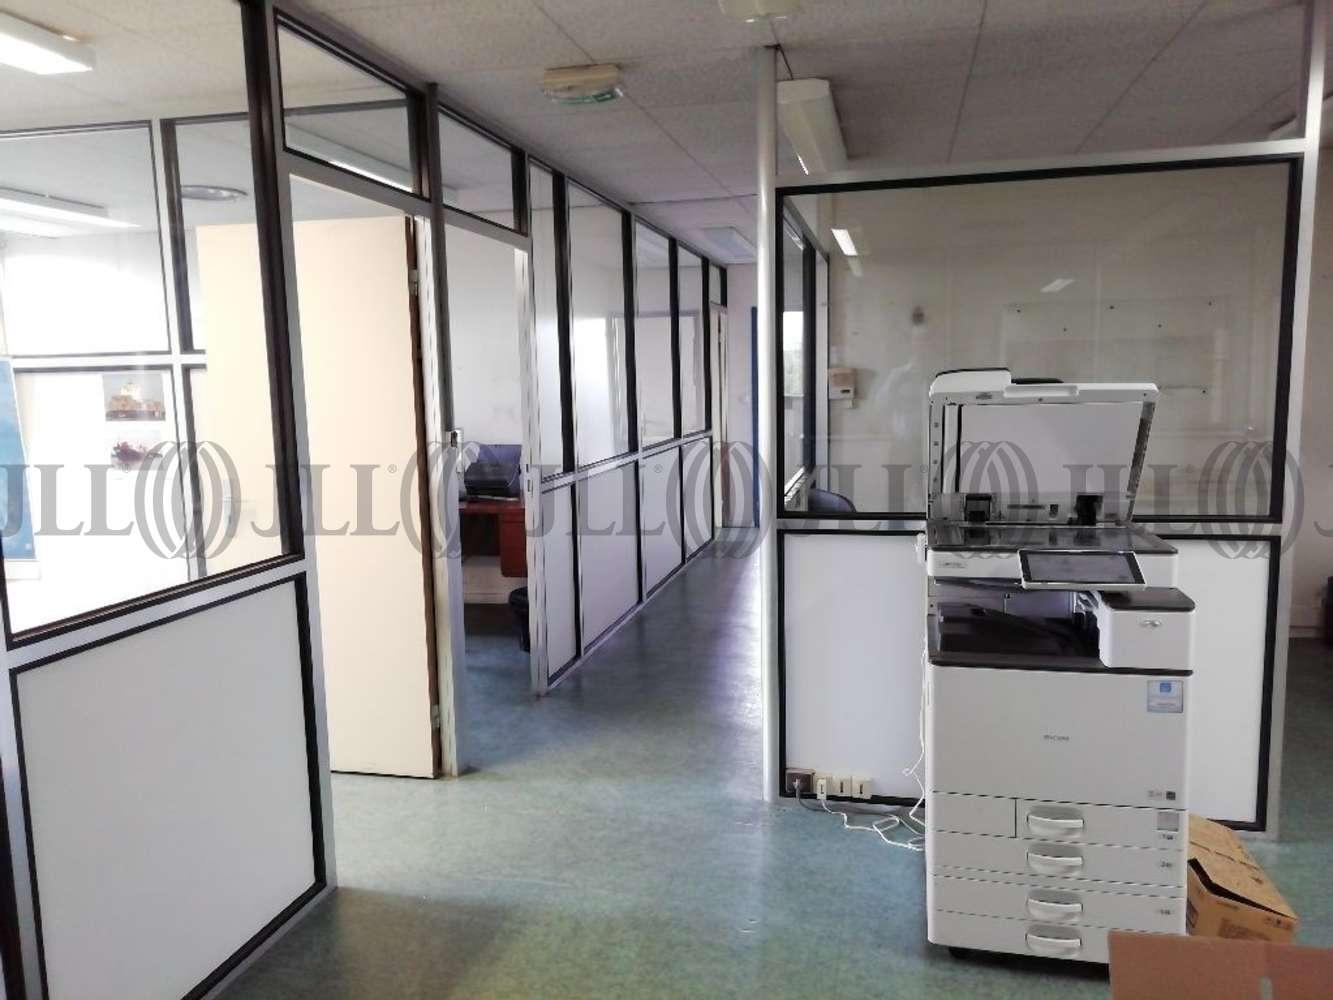 Activités/entrepôt Dardilly, 69570 - Location locaux d'activité Dardilly Lyon - 10815377